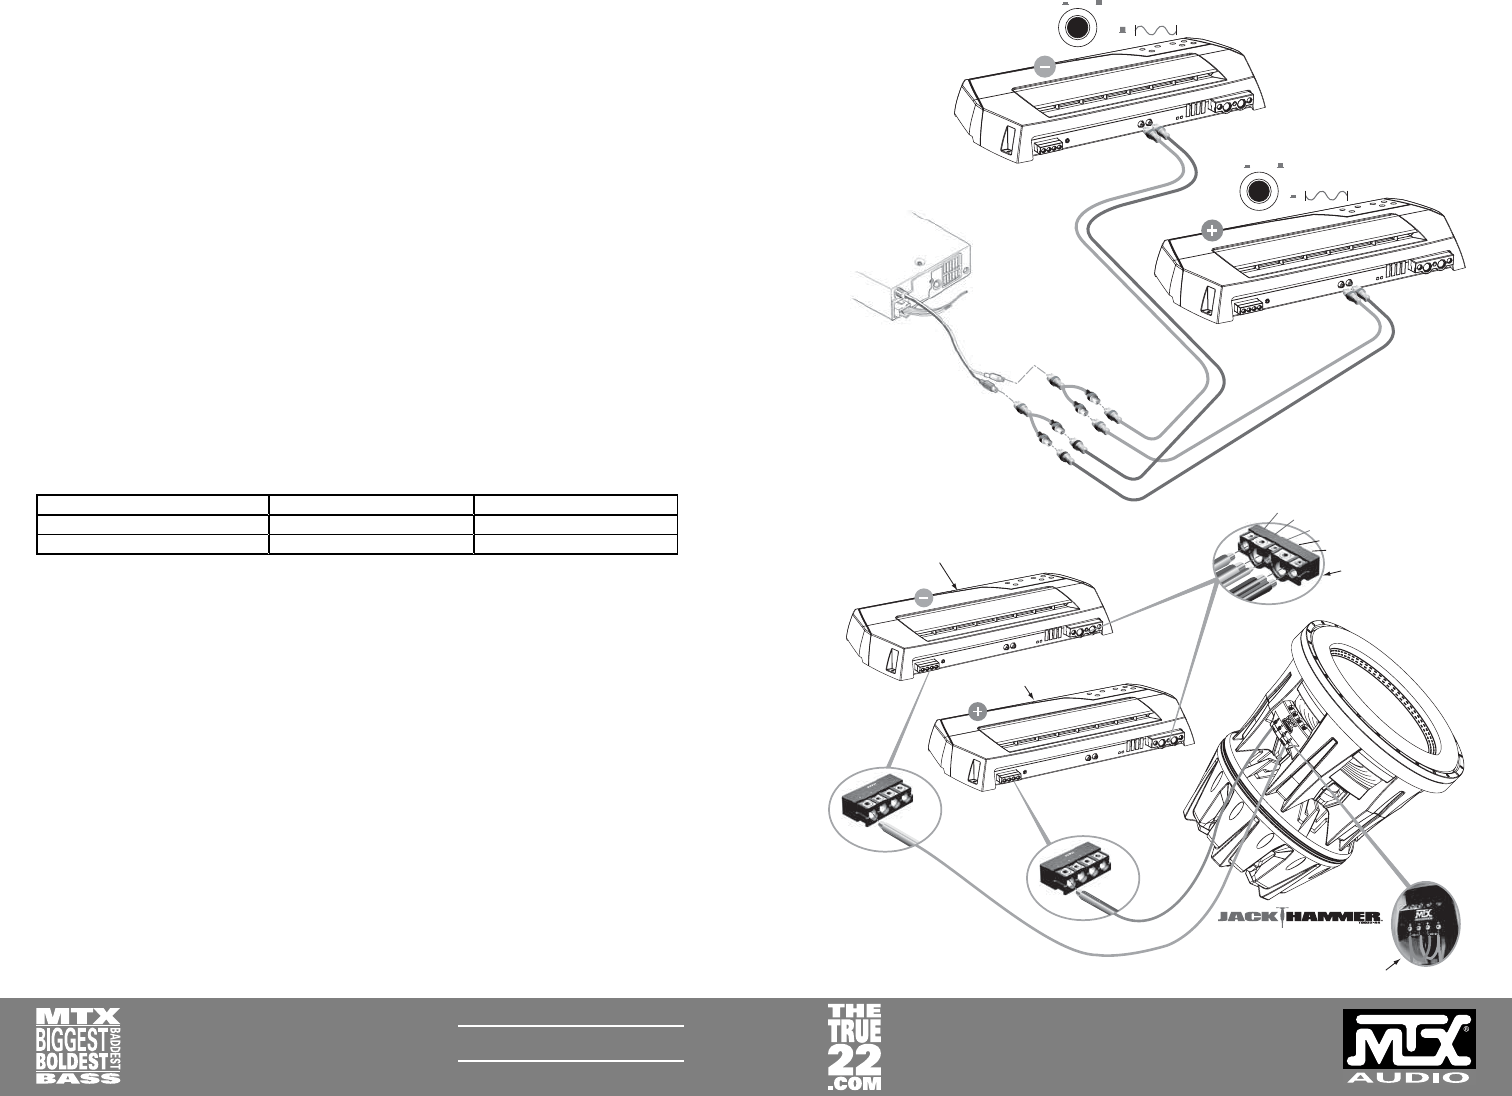 Mtx Audio Jackhammer Users Manual